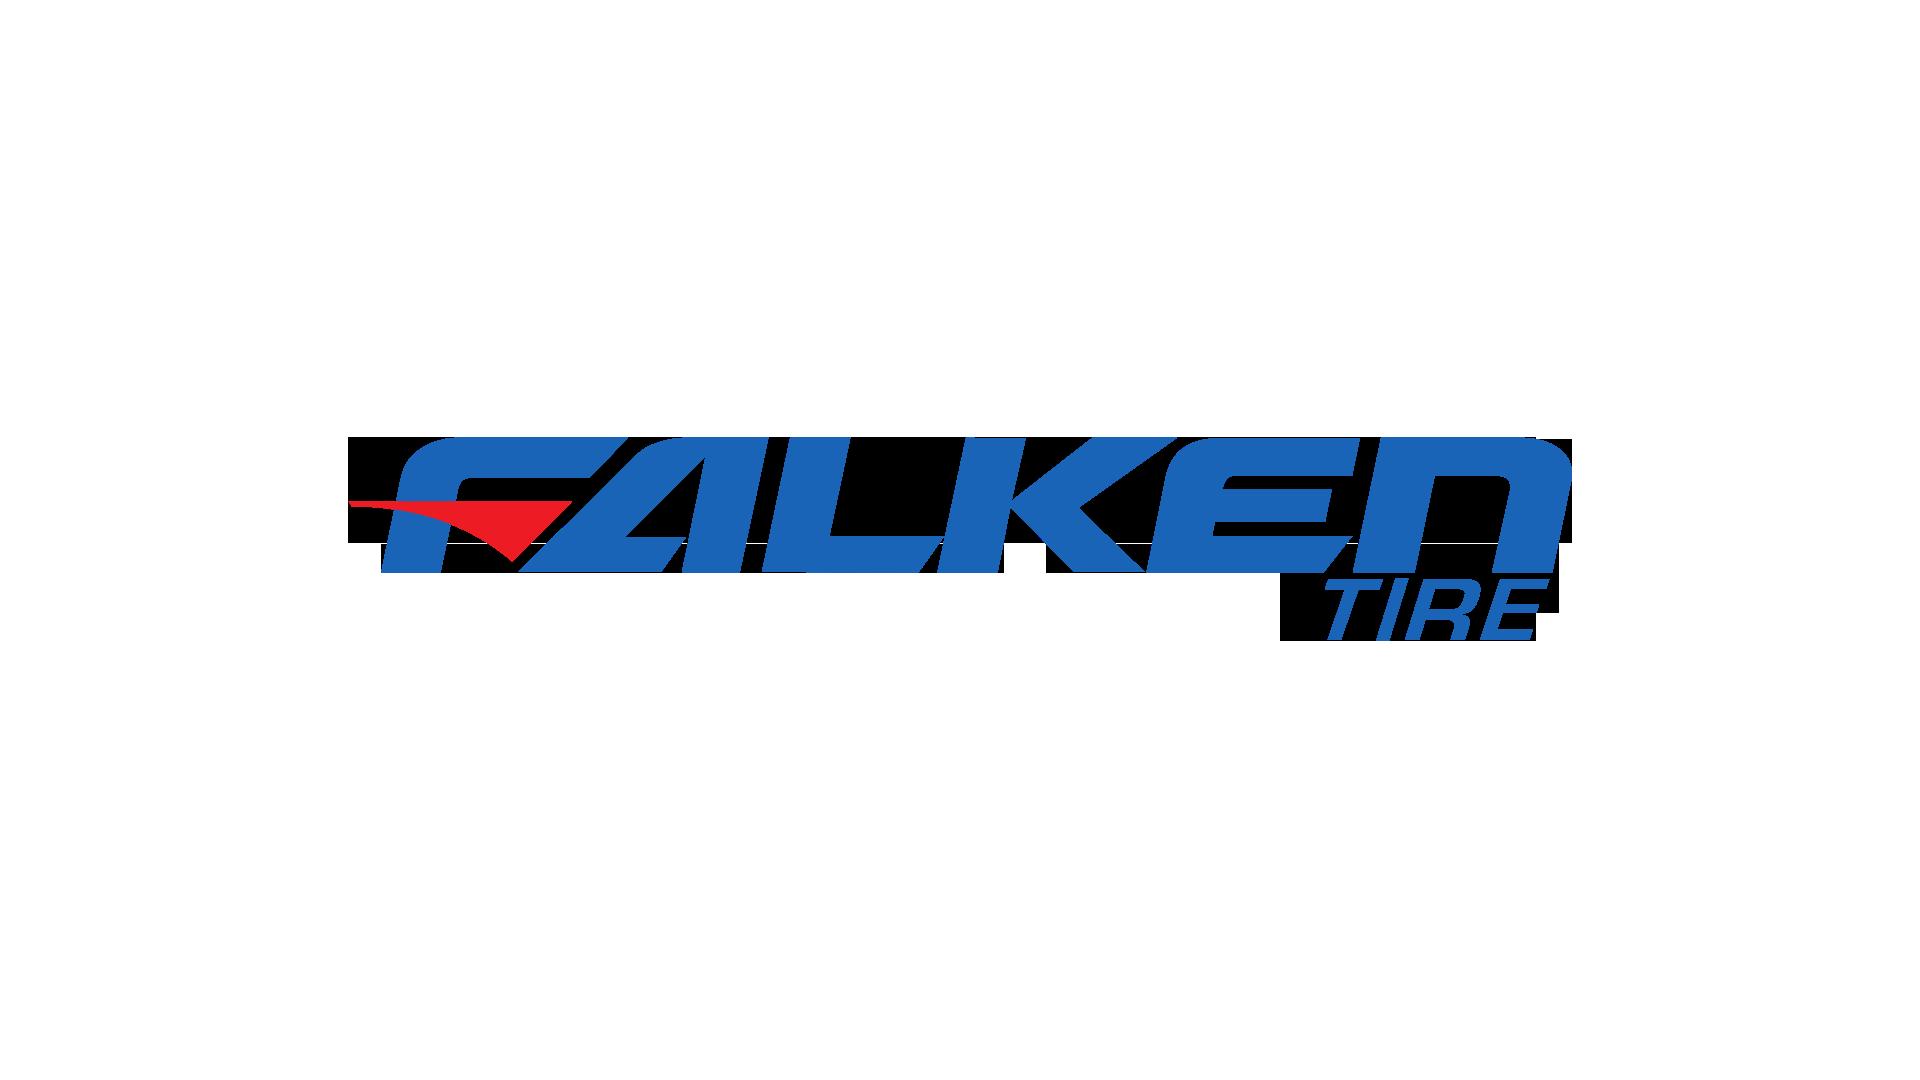 Falken Tire Logo Hd Png Information Carlogos Org